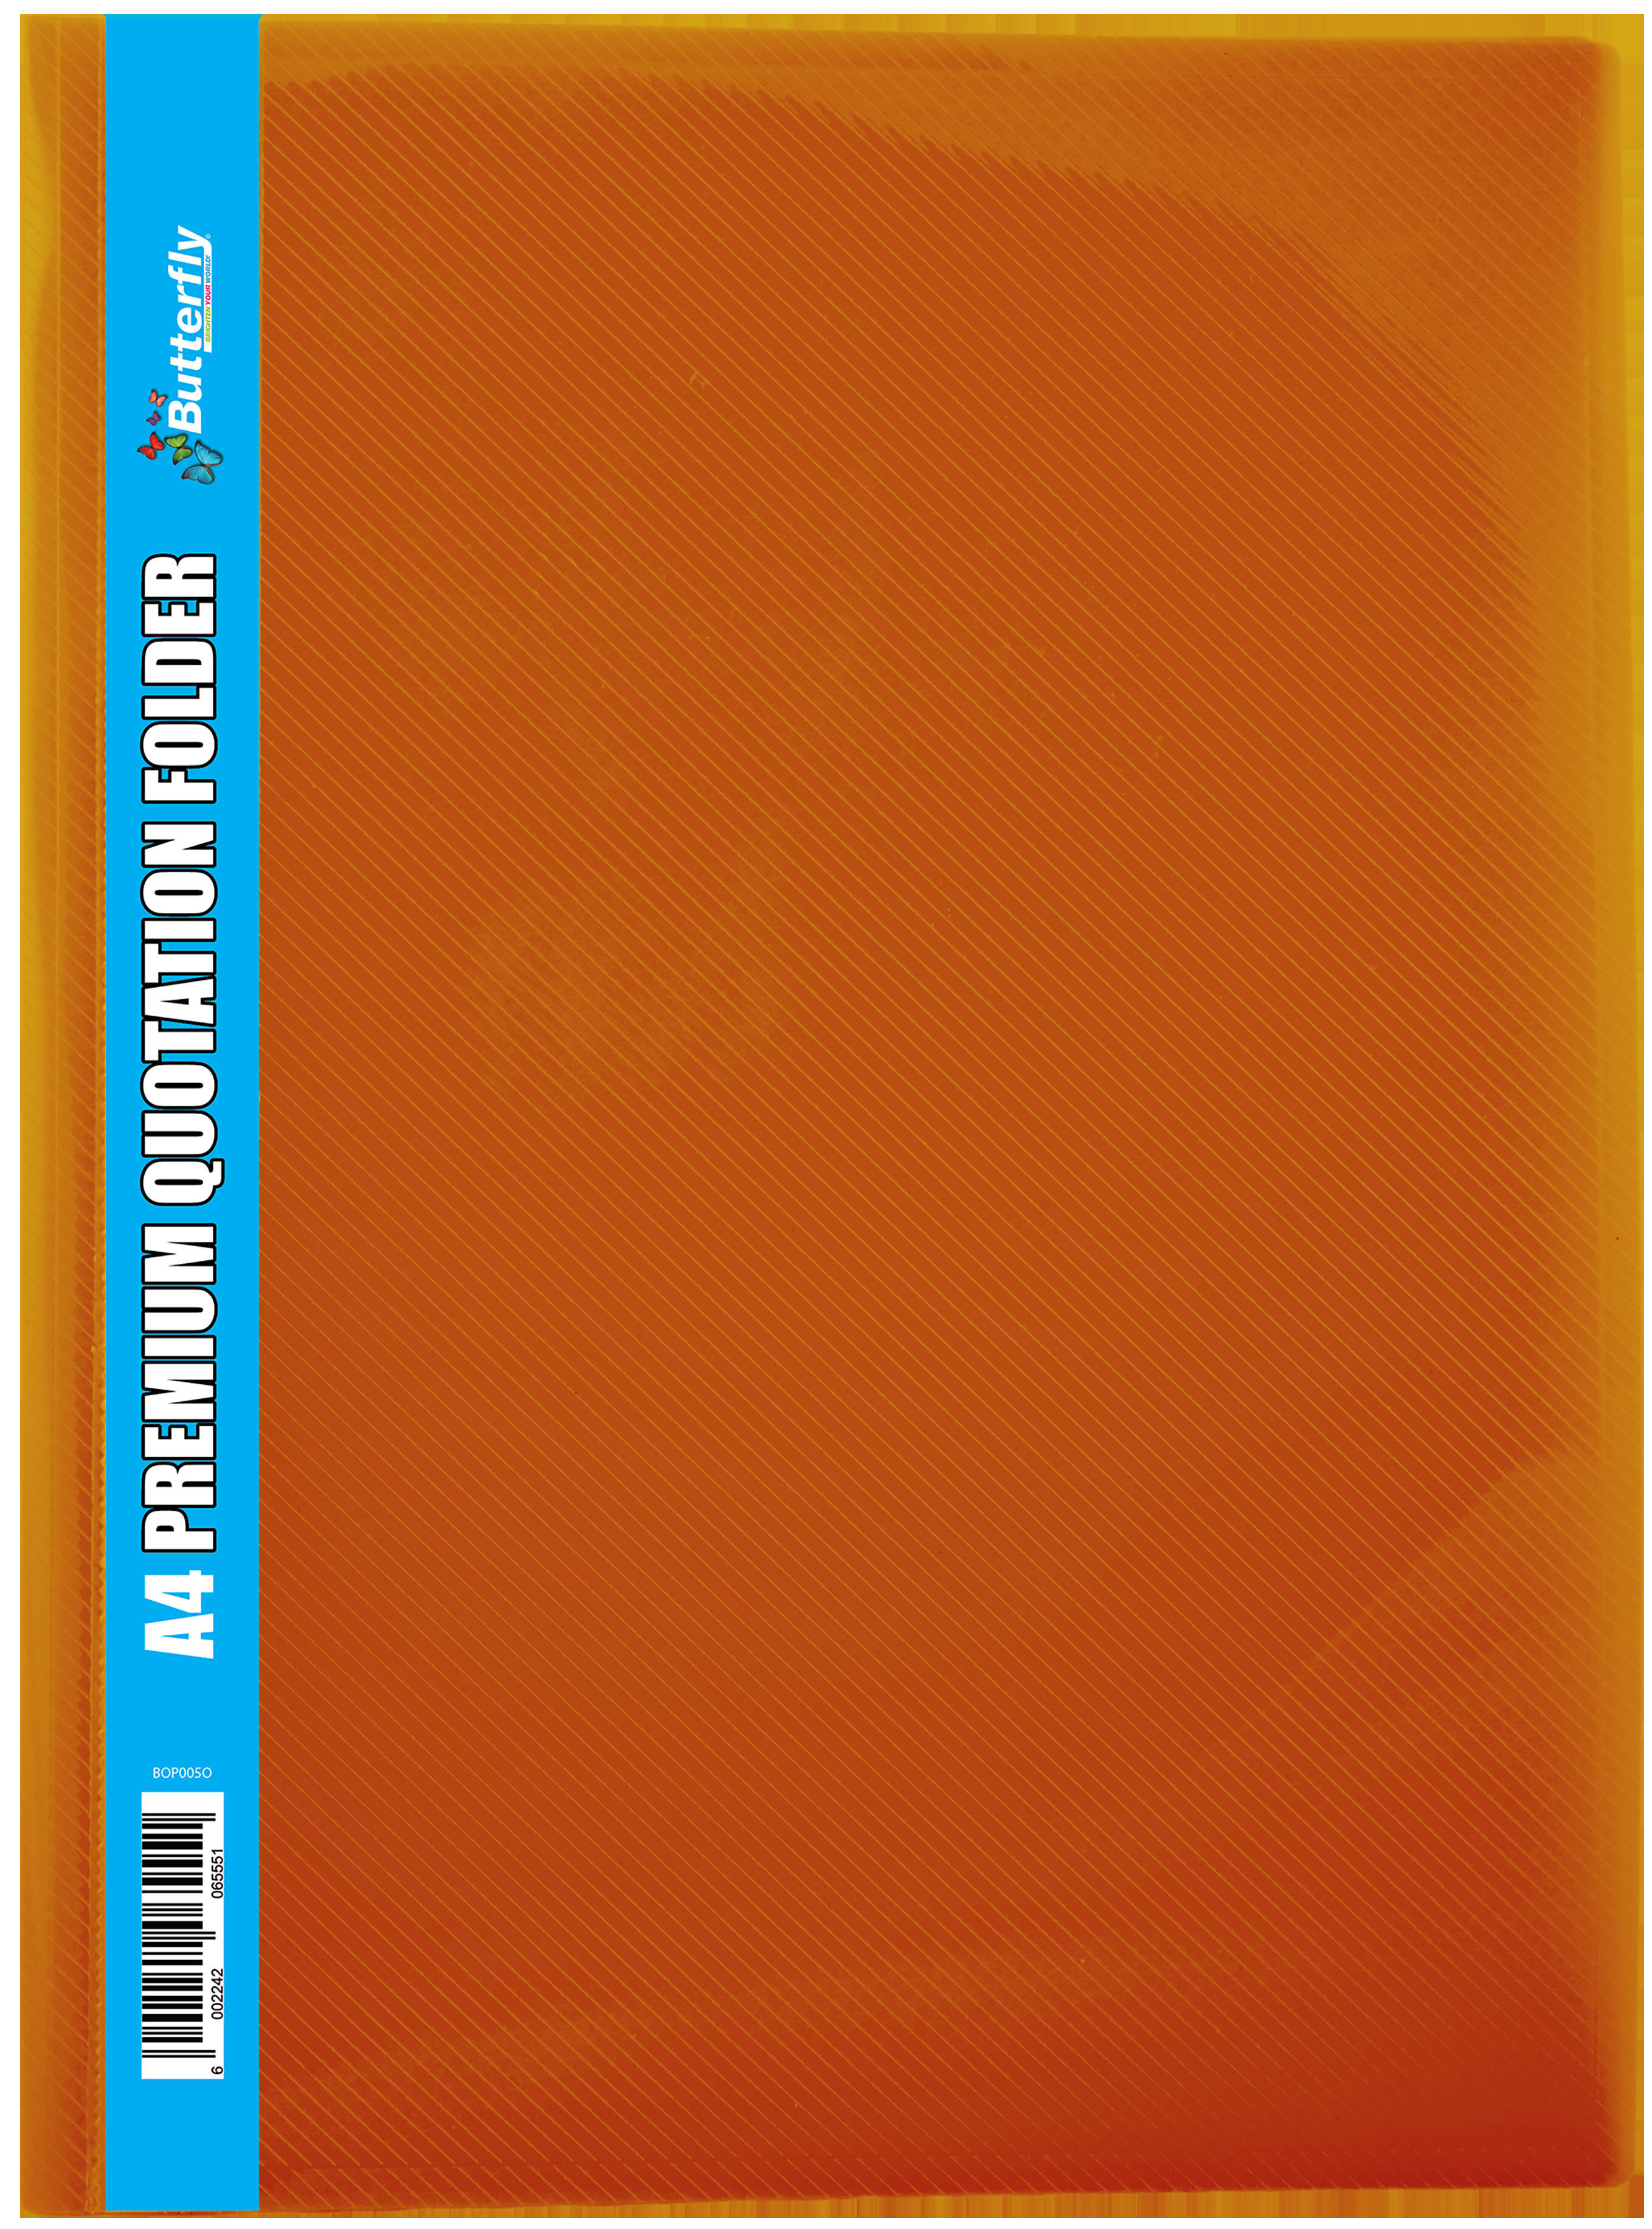 A4 Premium Quotation Folders - 400 Micron - Orange